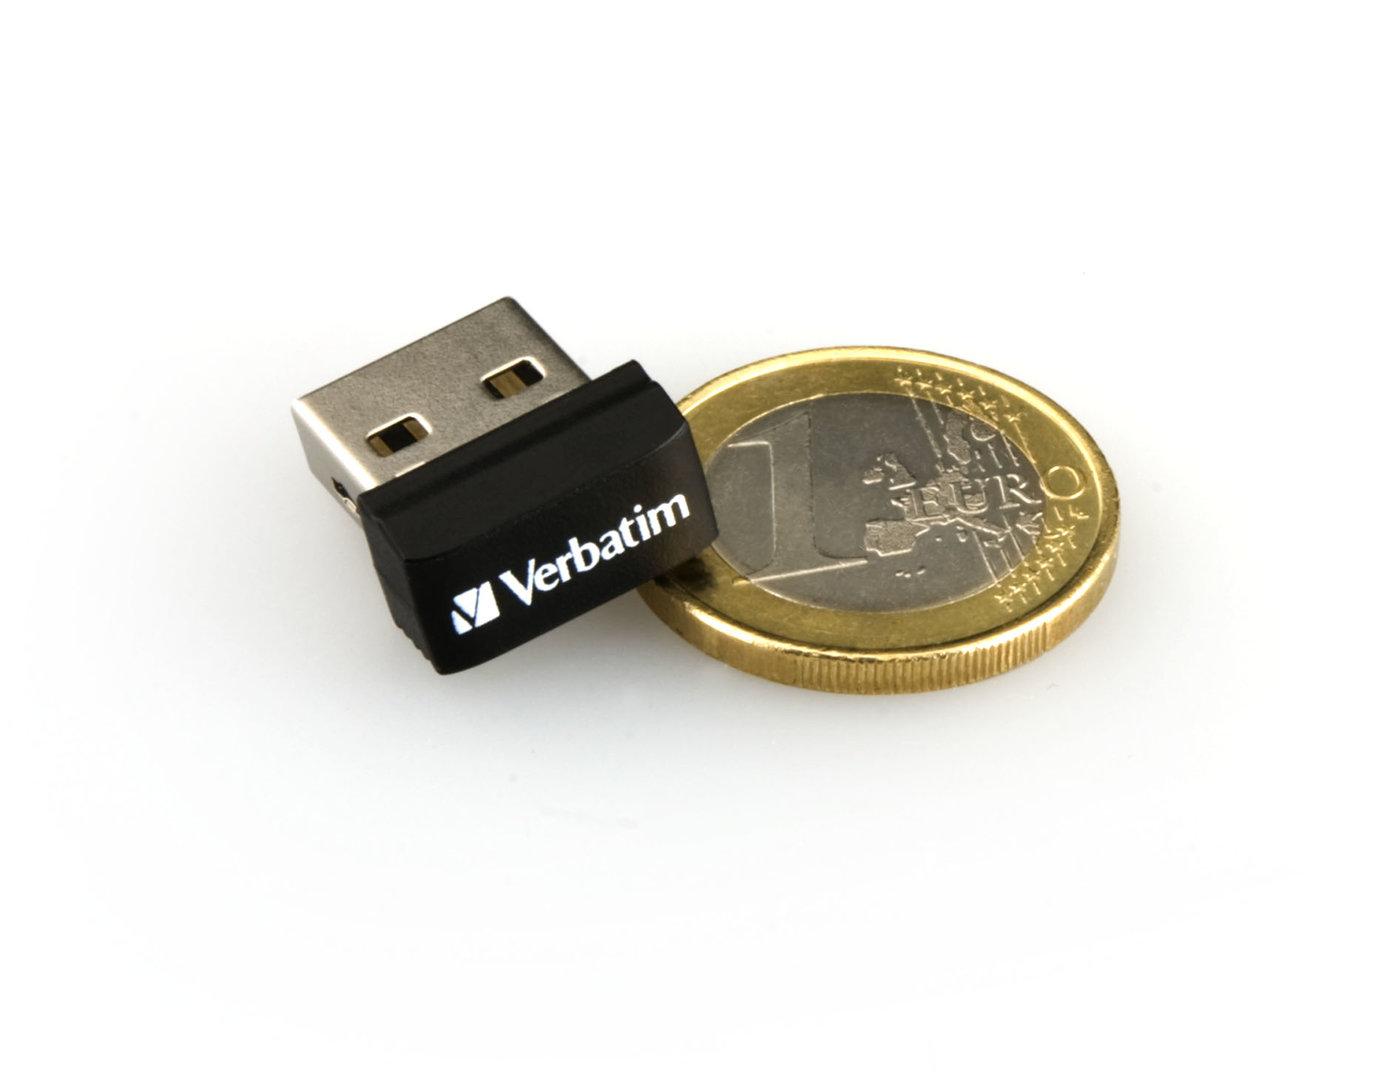 Verbatim Store 'n' Go Netbook USB Drive